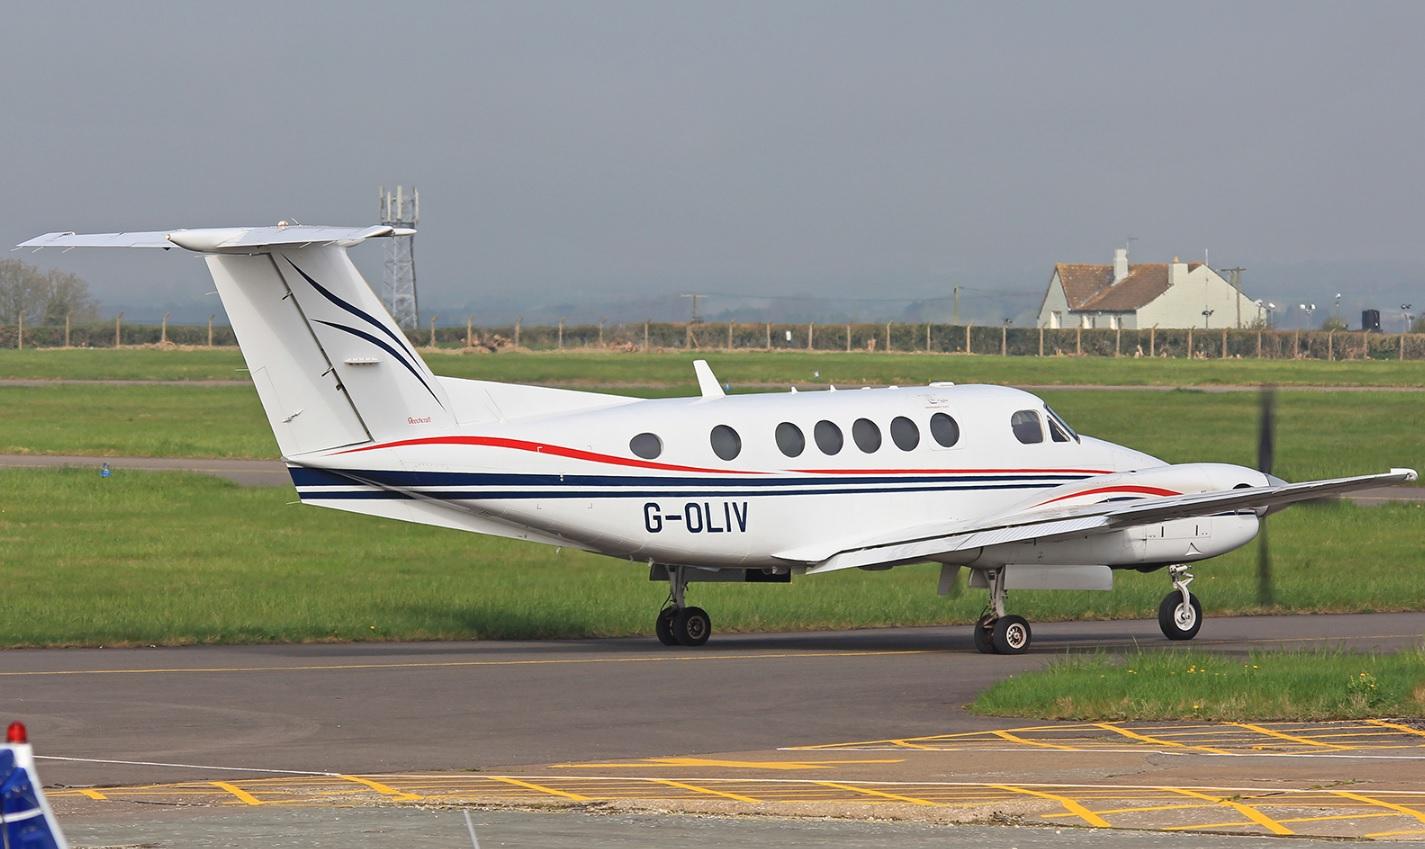 King Air 200 G-OLIV